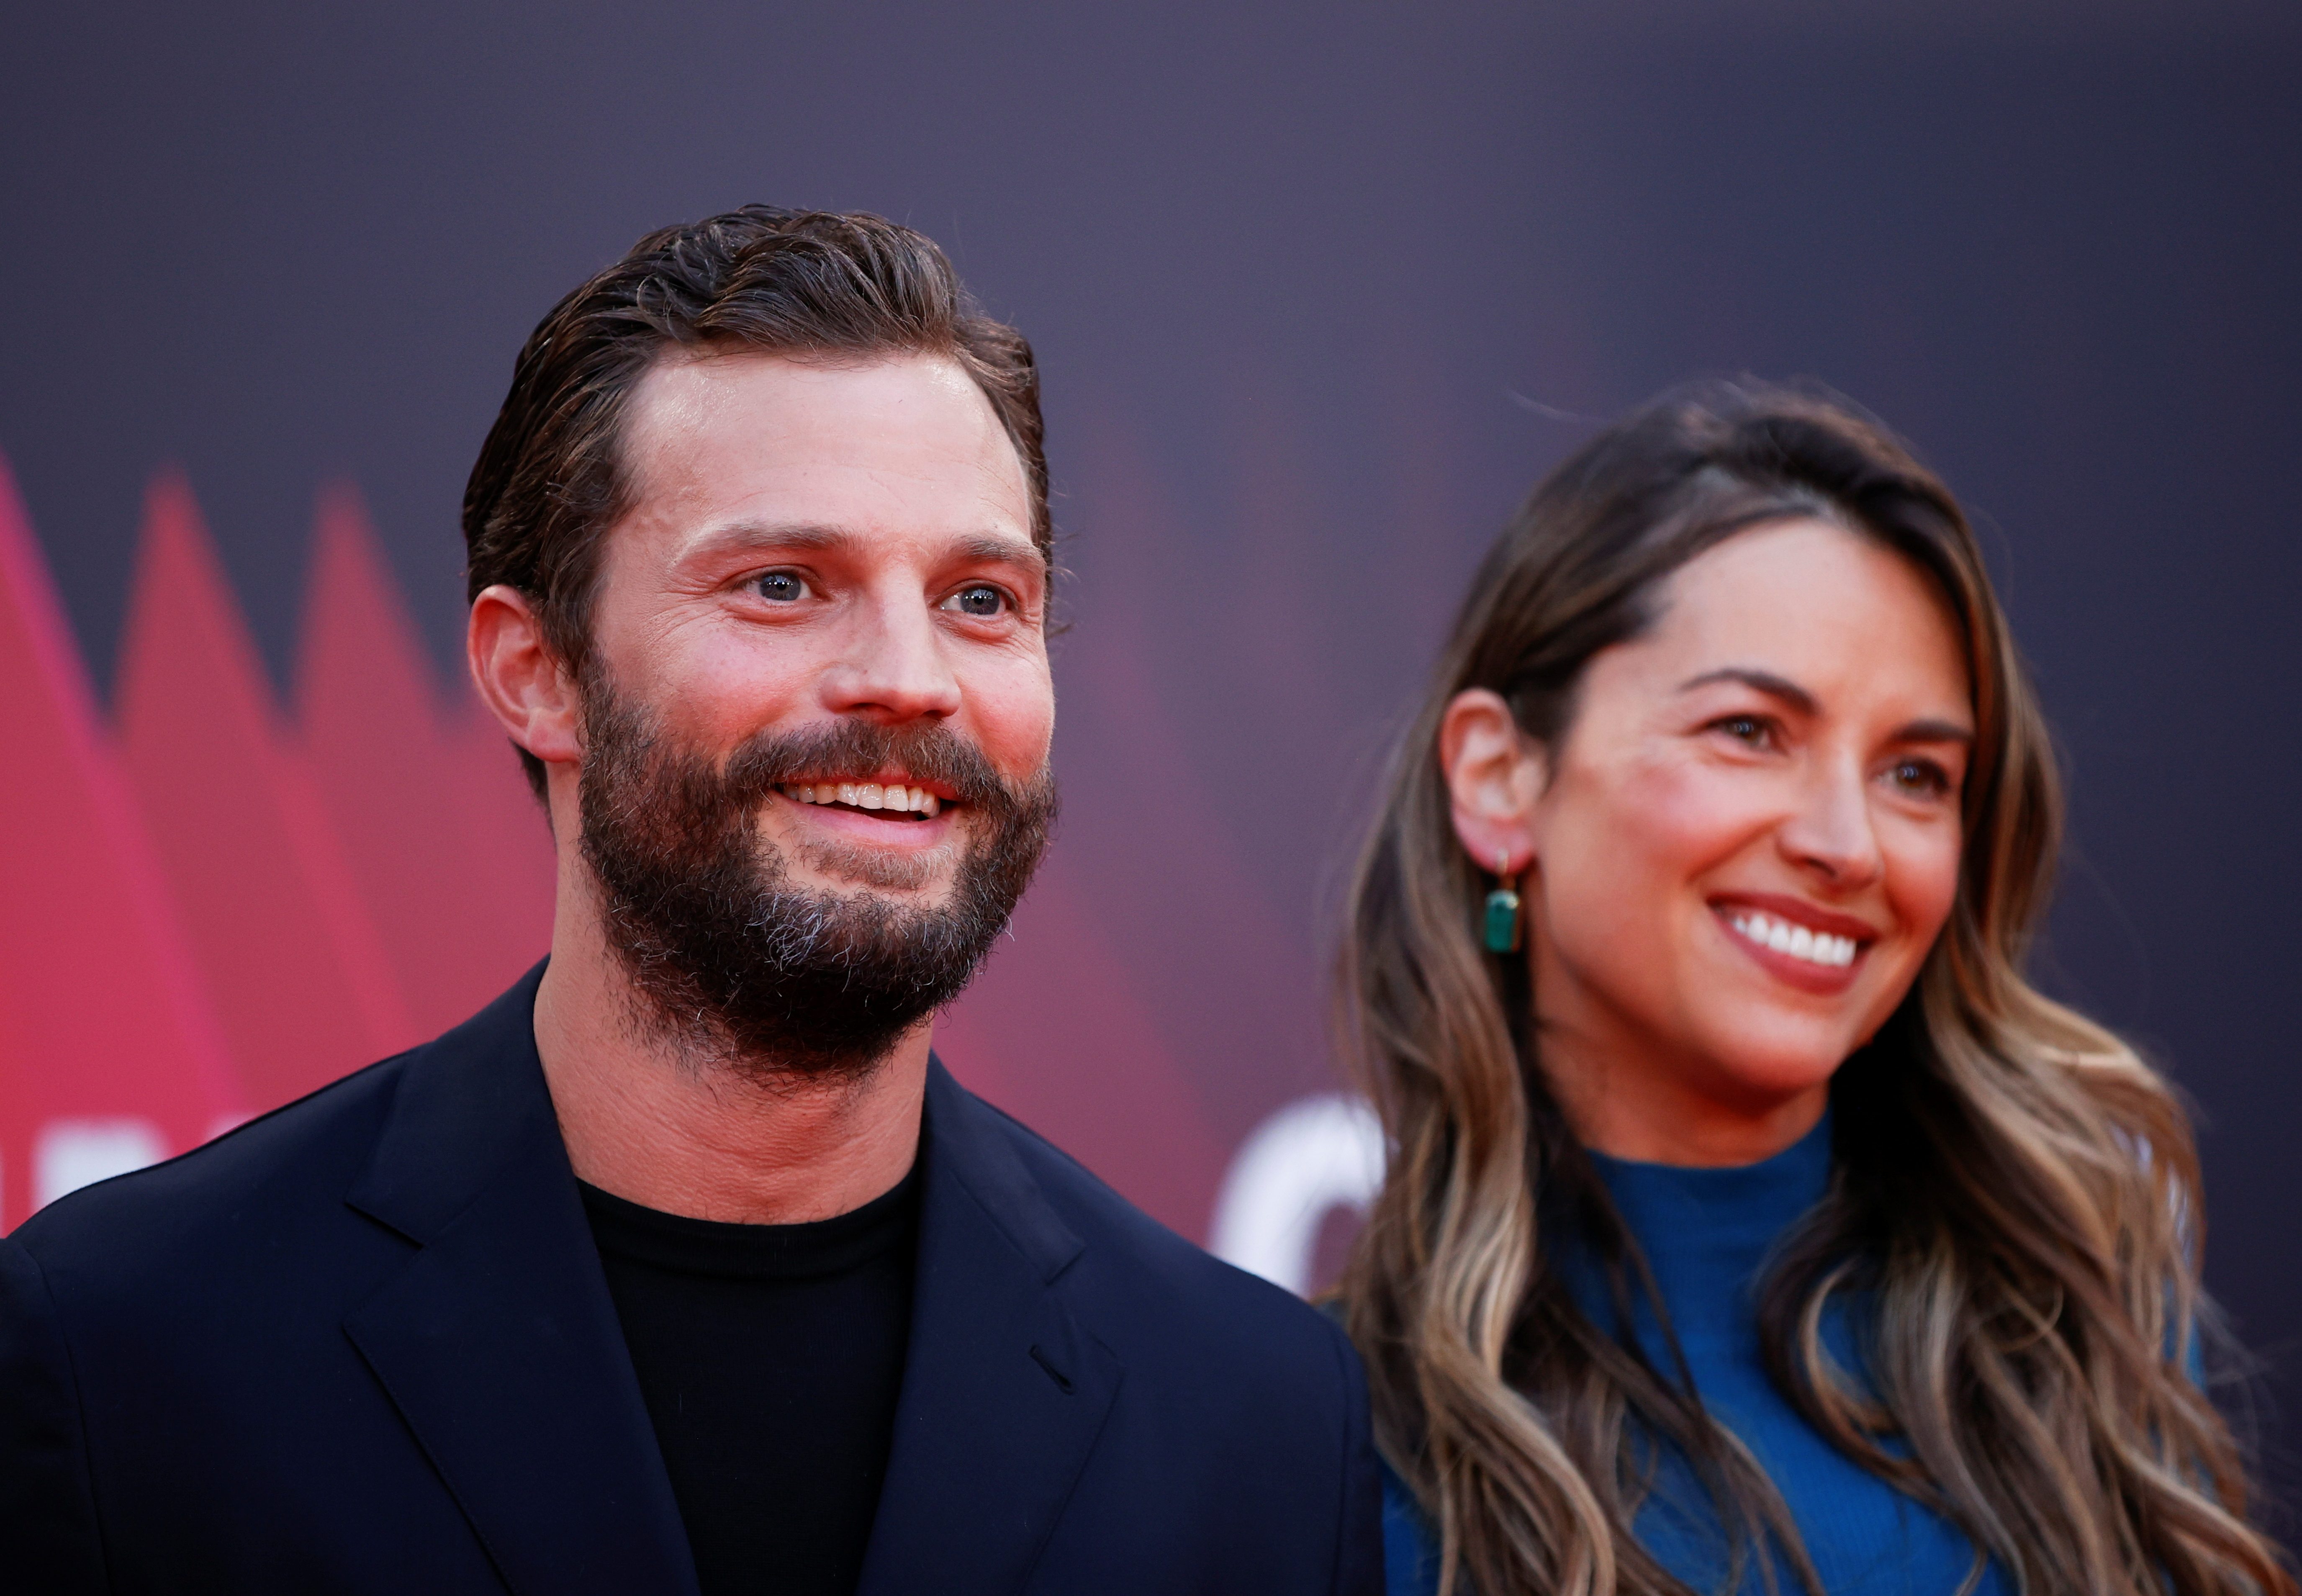 Cast member Jamie Dornan and Amelia Warner arrive at a screening of the film